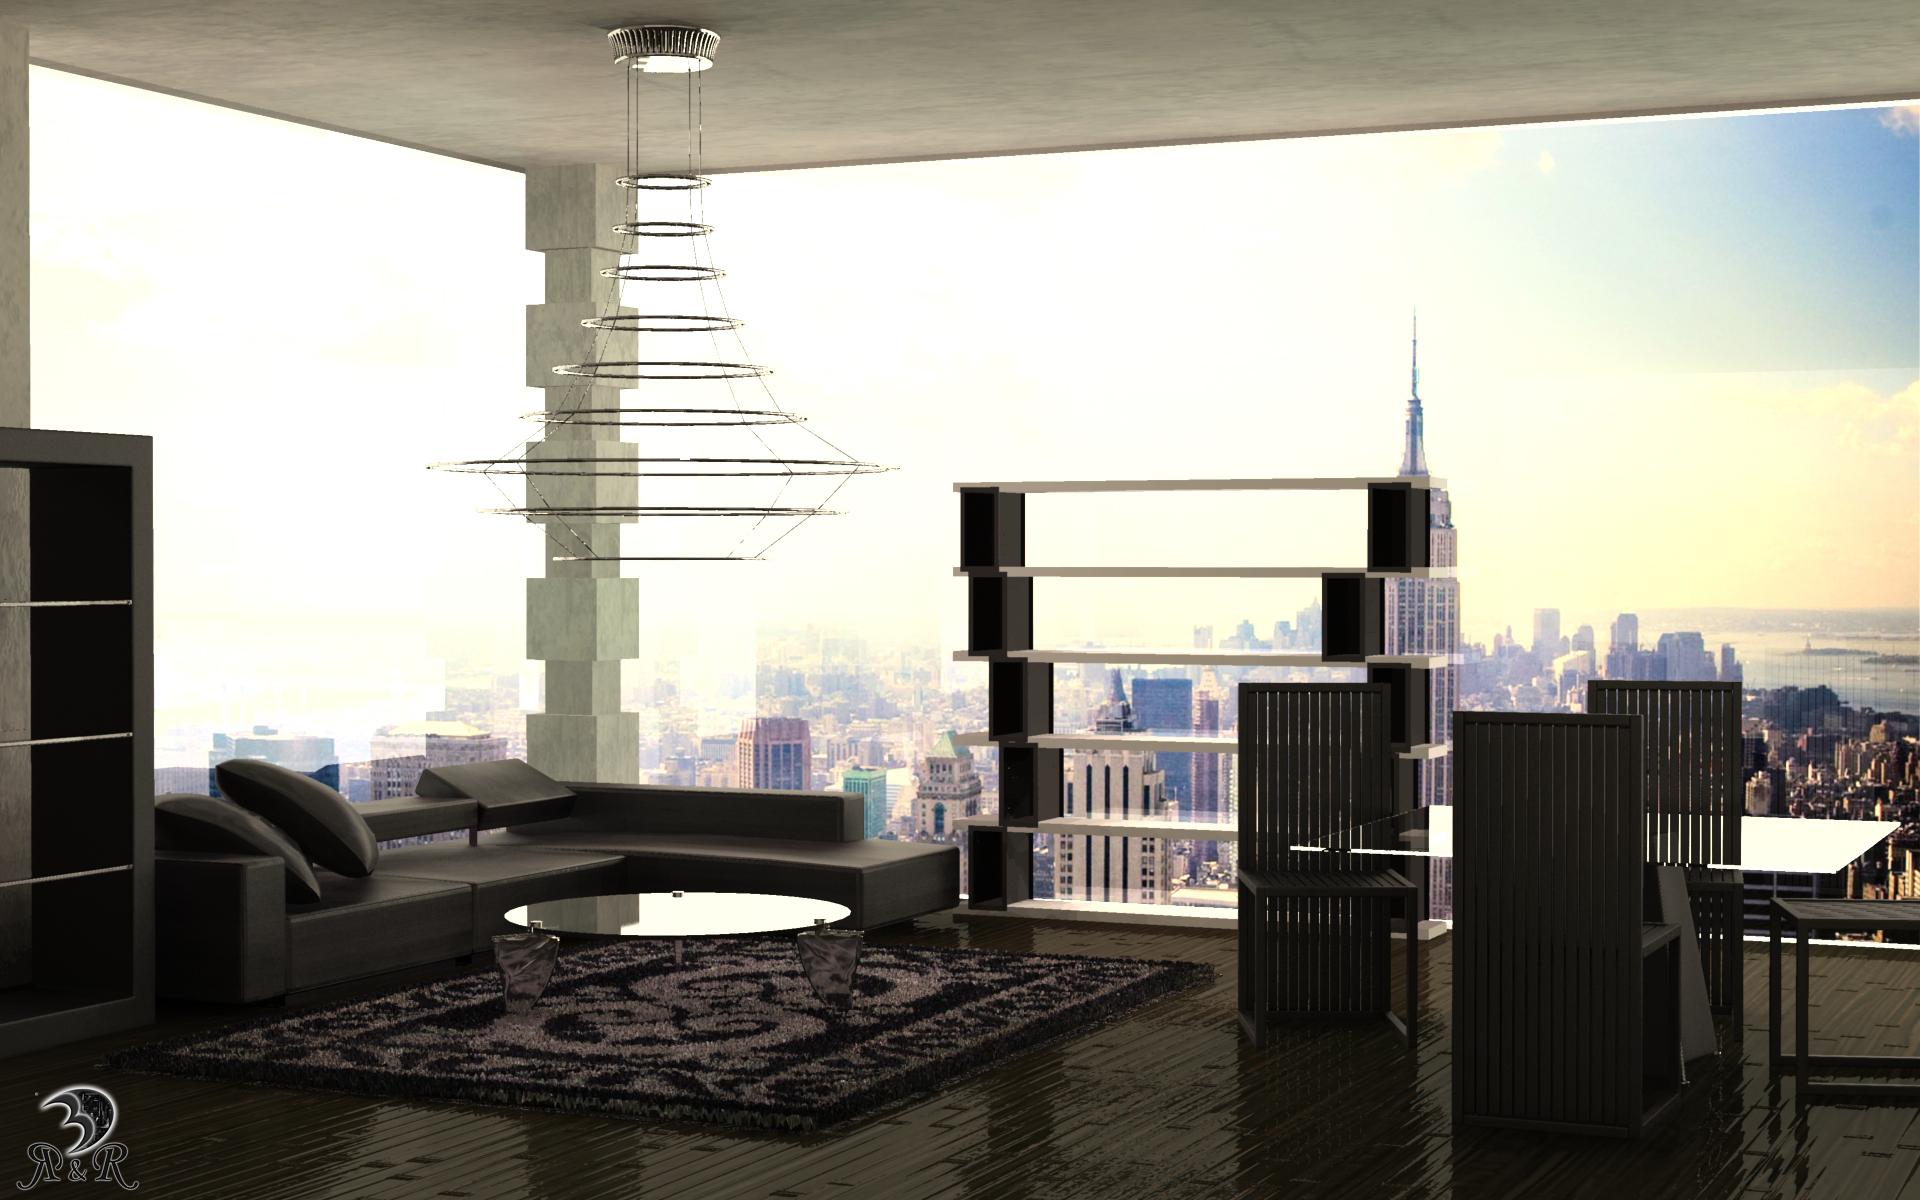 loft in new york by deeo elaclaire on deviantart. Black Bedroom Furniture Sets. Home Design Ideas